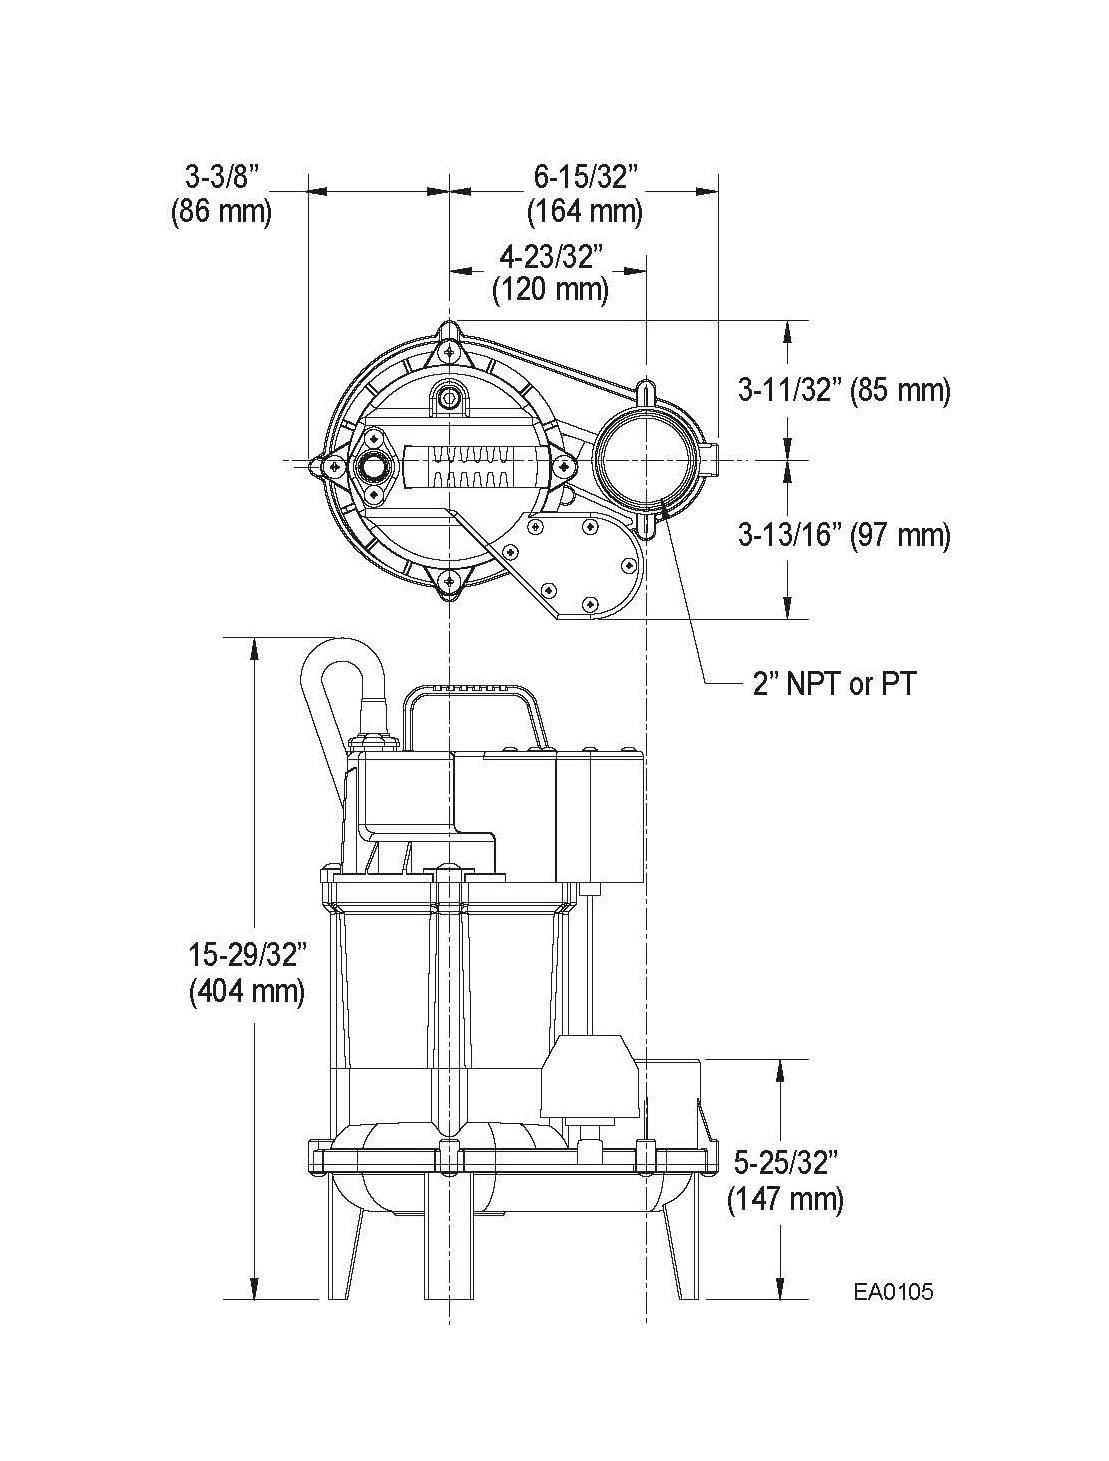 Taiwan Sewage Pump Dewatering Model 222 Zoeller Submersible Wiring Diagram